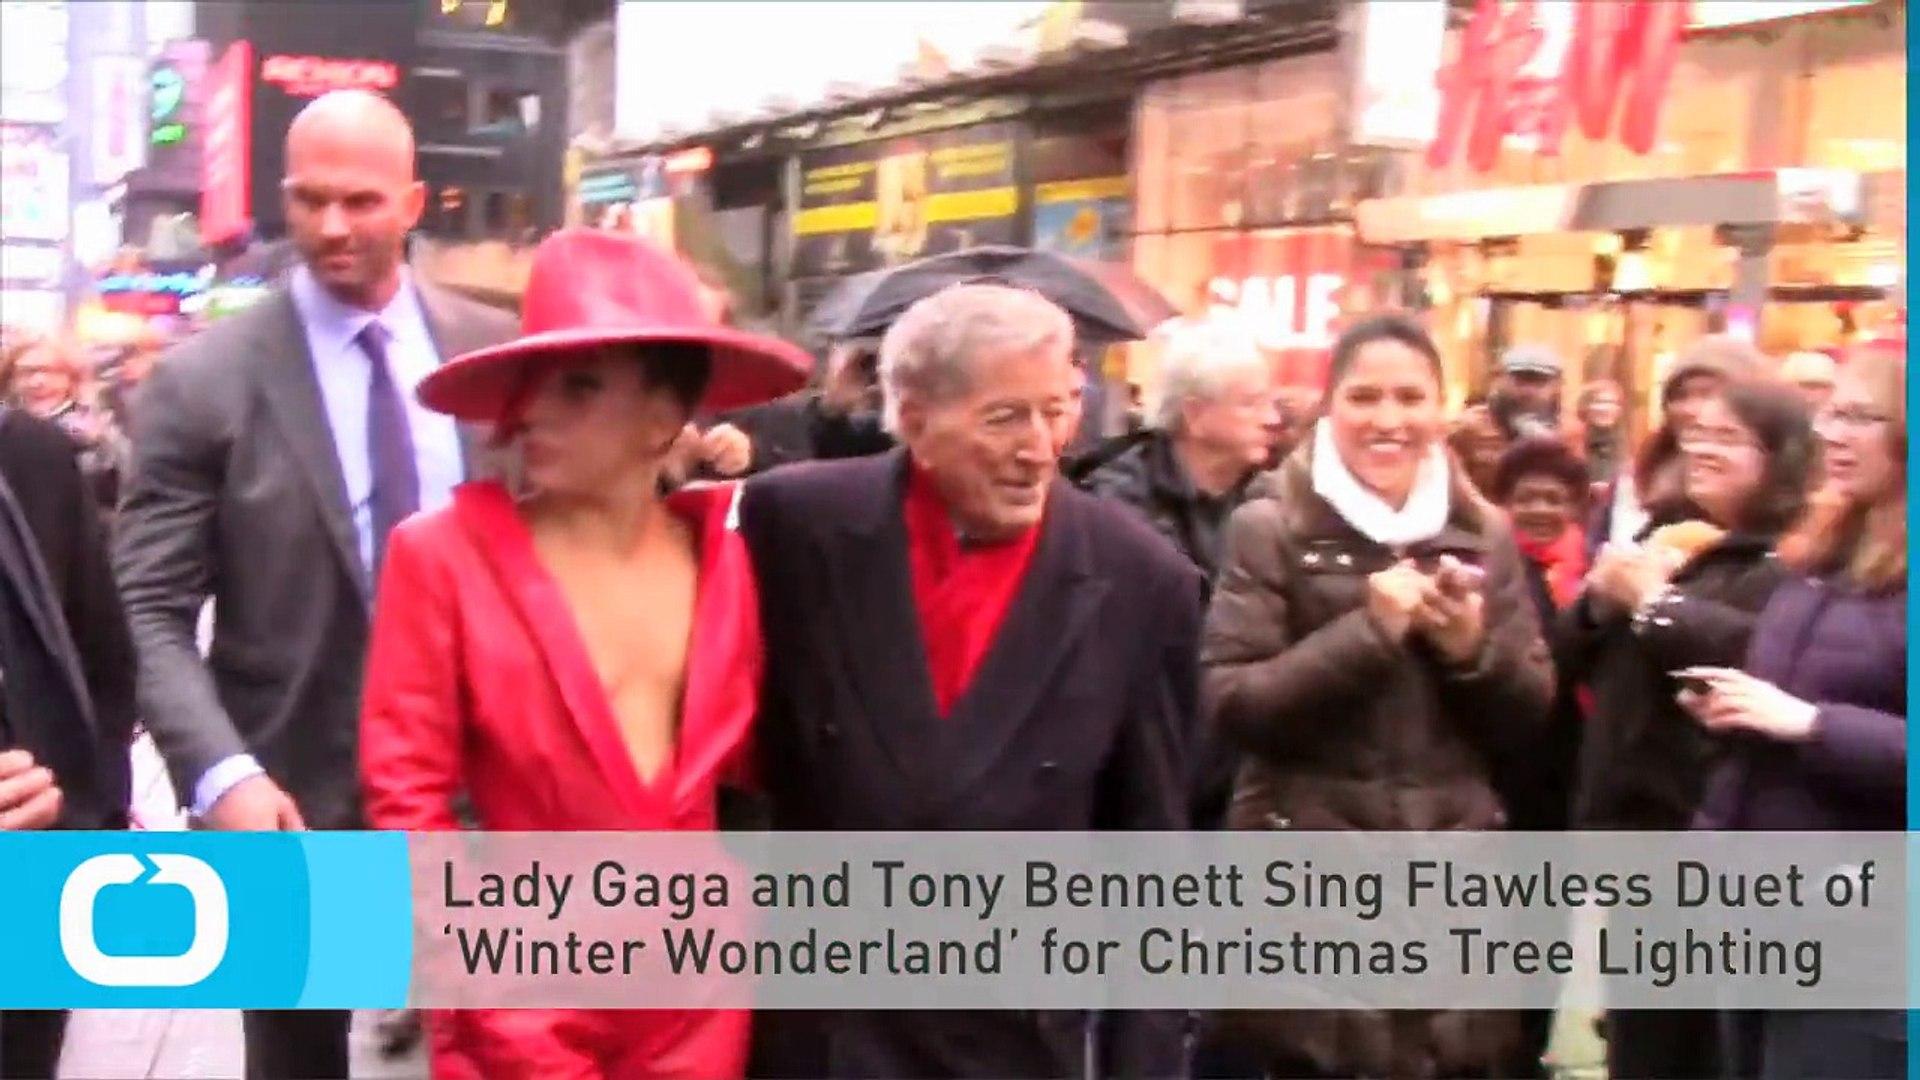 Lady Gaga and Tony Bennett Sing Flawless Duet of 'Winter Wonderland' for  Christmas Tree Lighting Ceremony